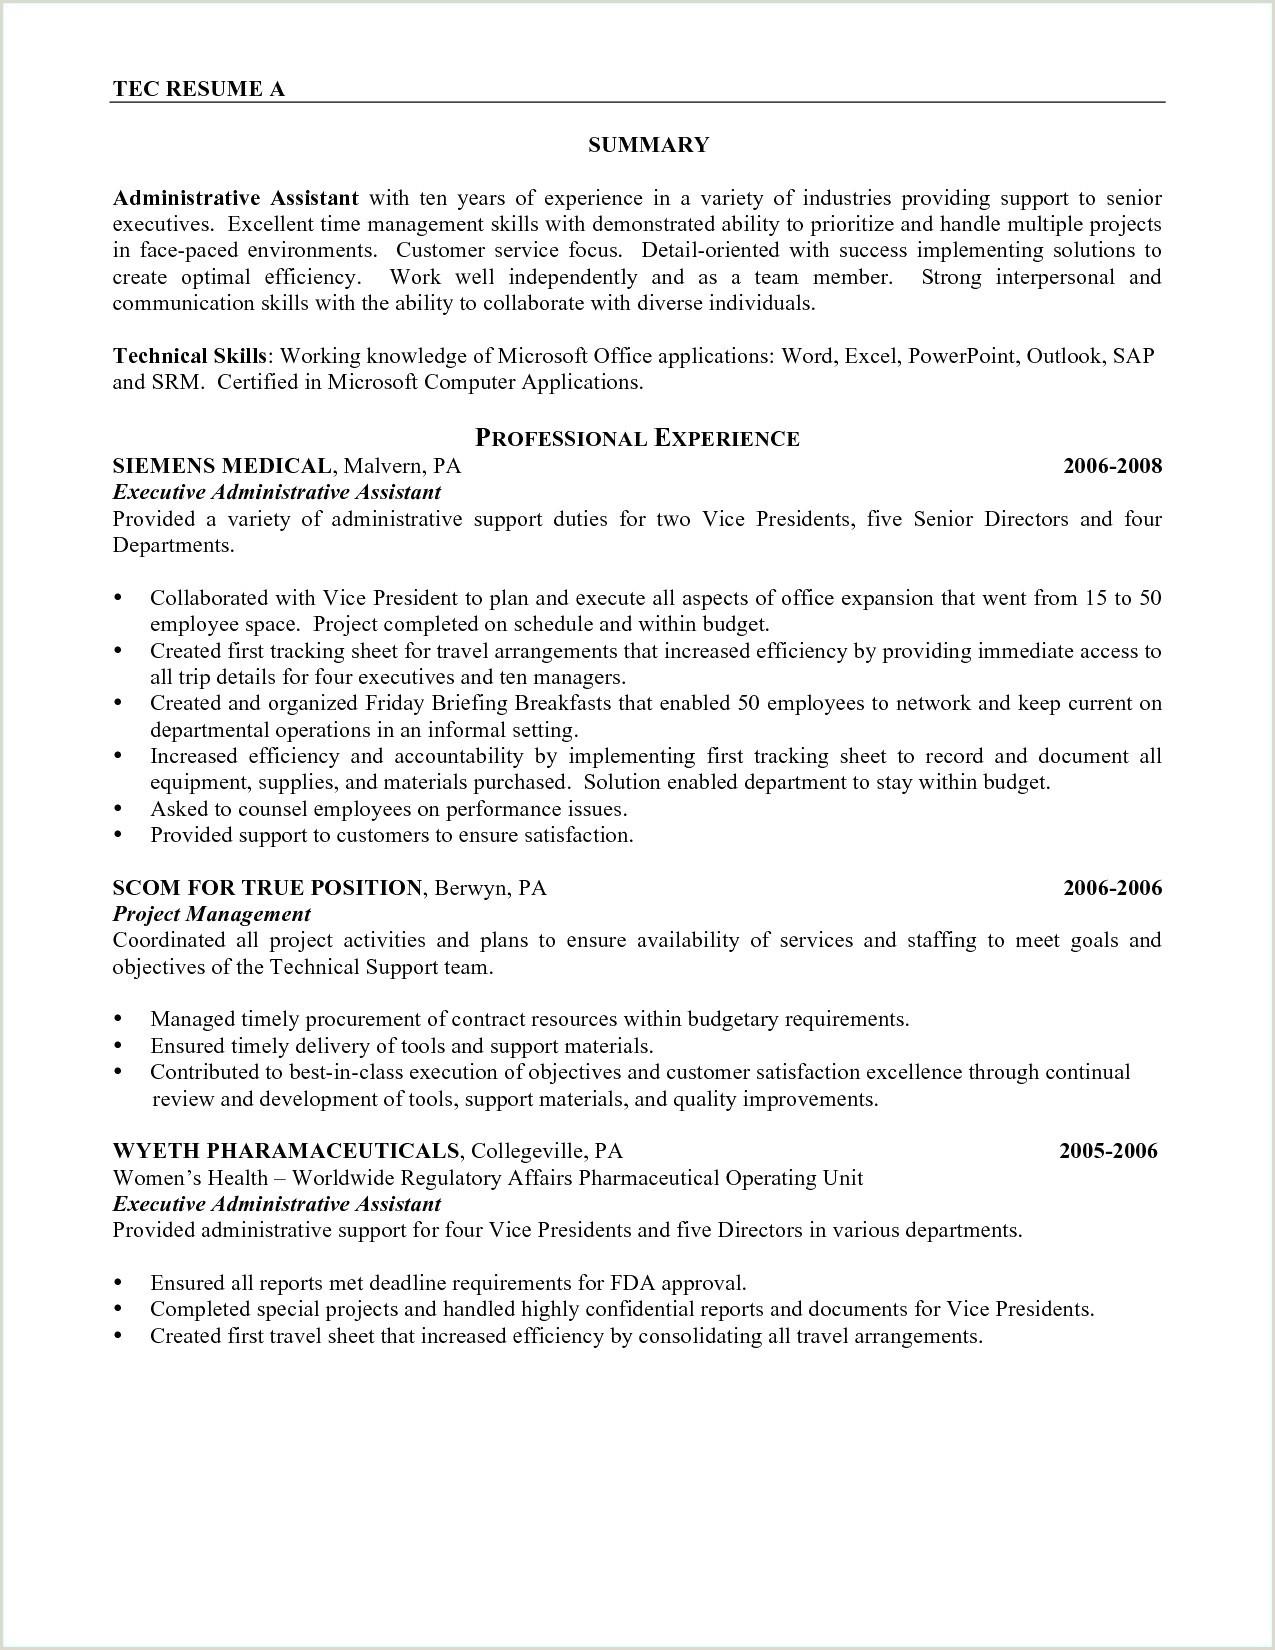 Administration Job Application Cover Letter Unique Sample